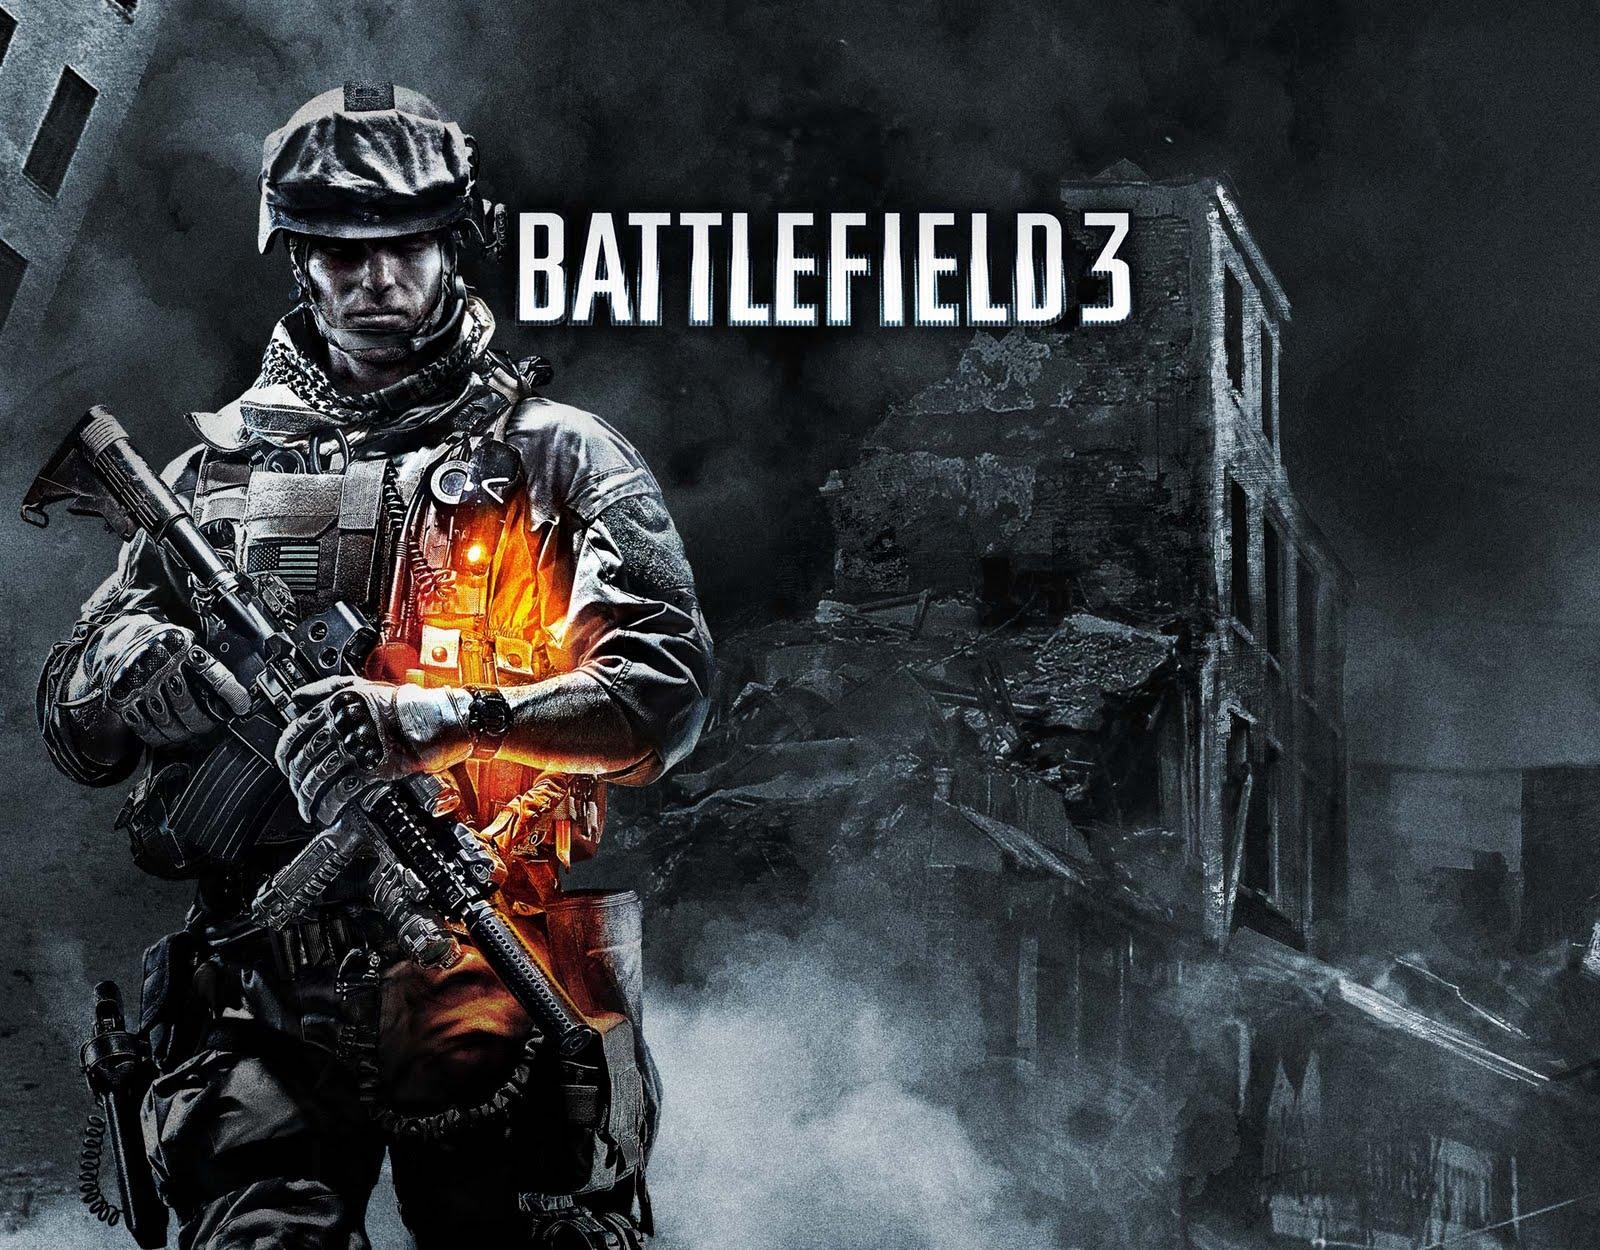 Battlefield 3 Wallpaper 1   Battlefield Informer Gallery 1600x1250